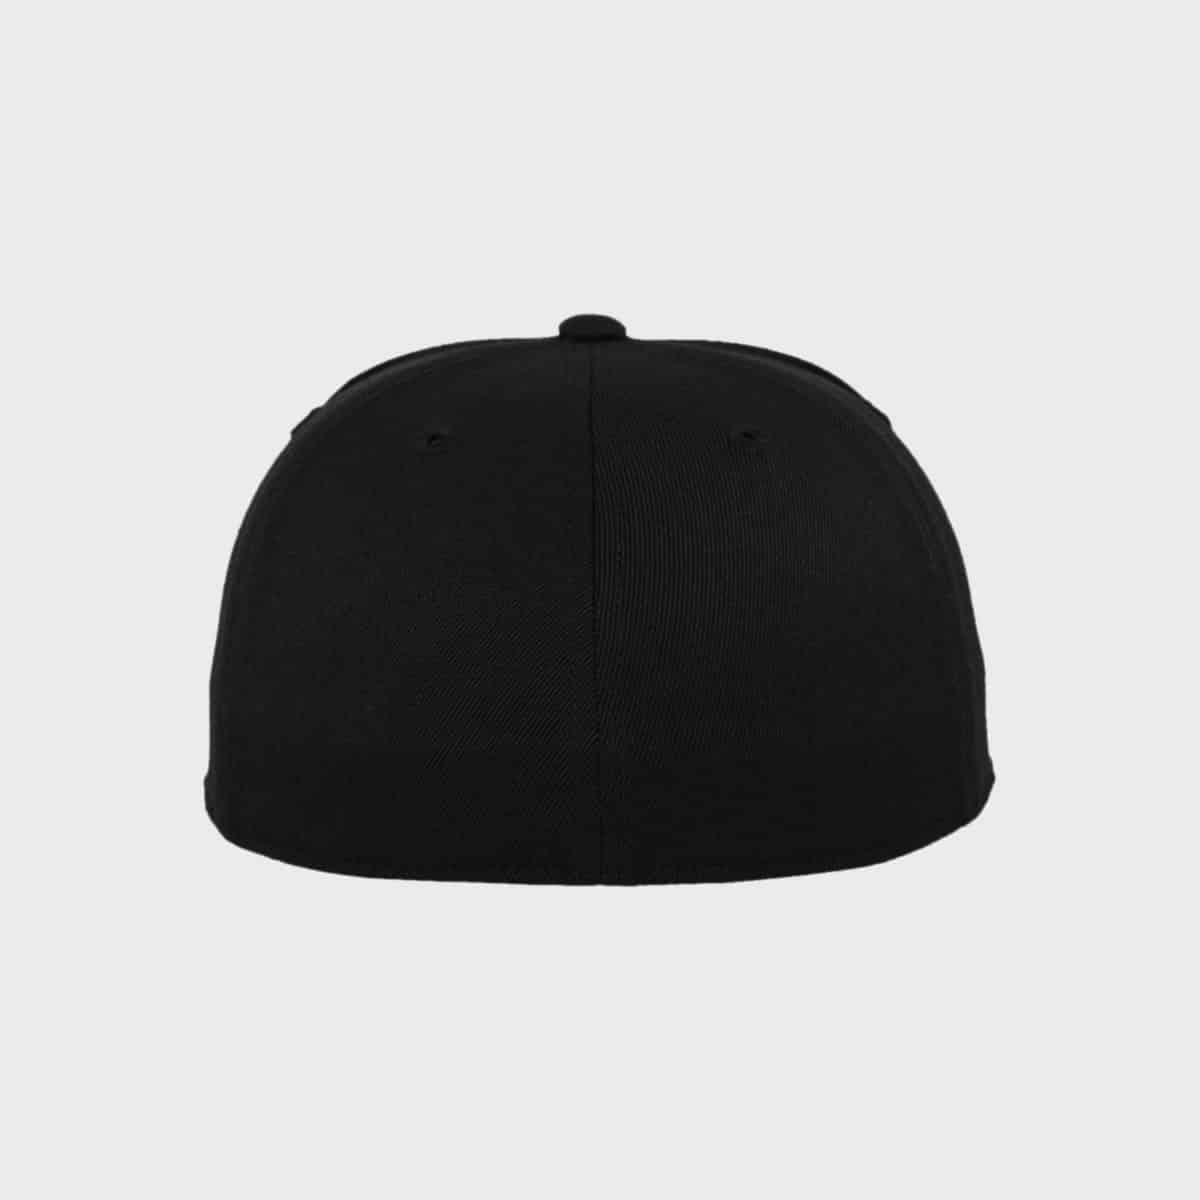 Flexfit FlexfitCaps FFE 6210 Black Back